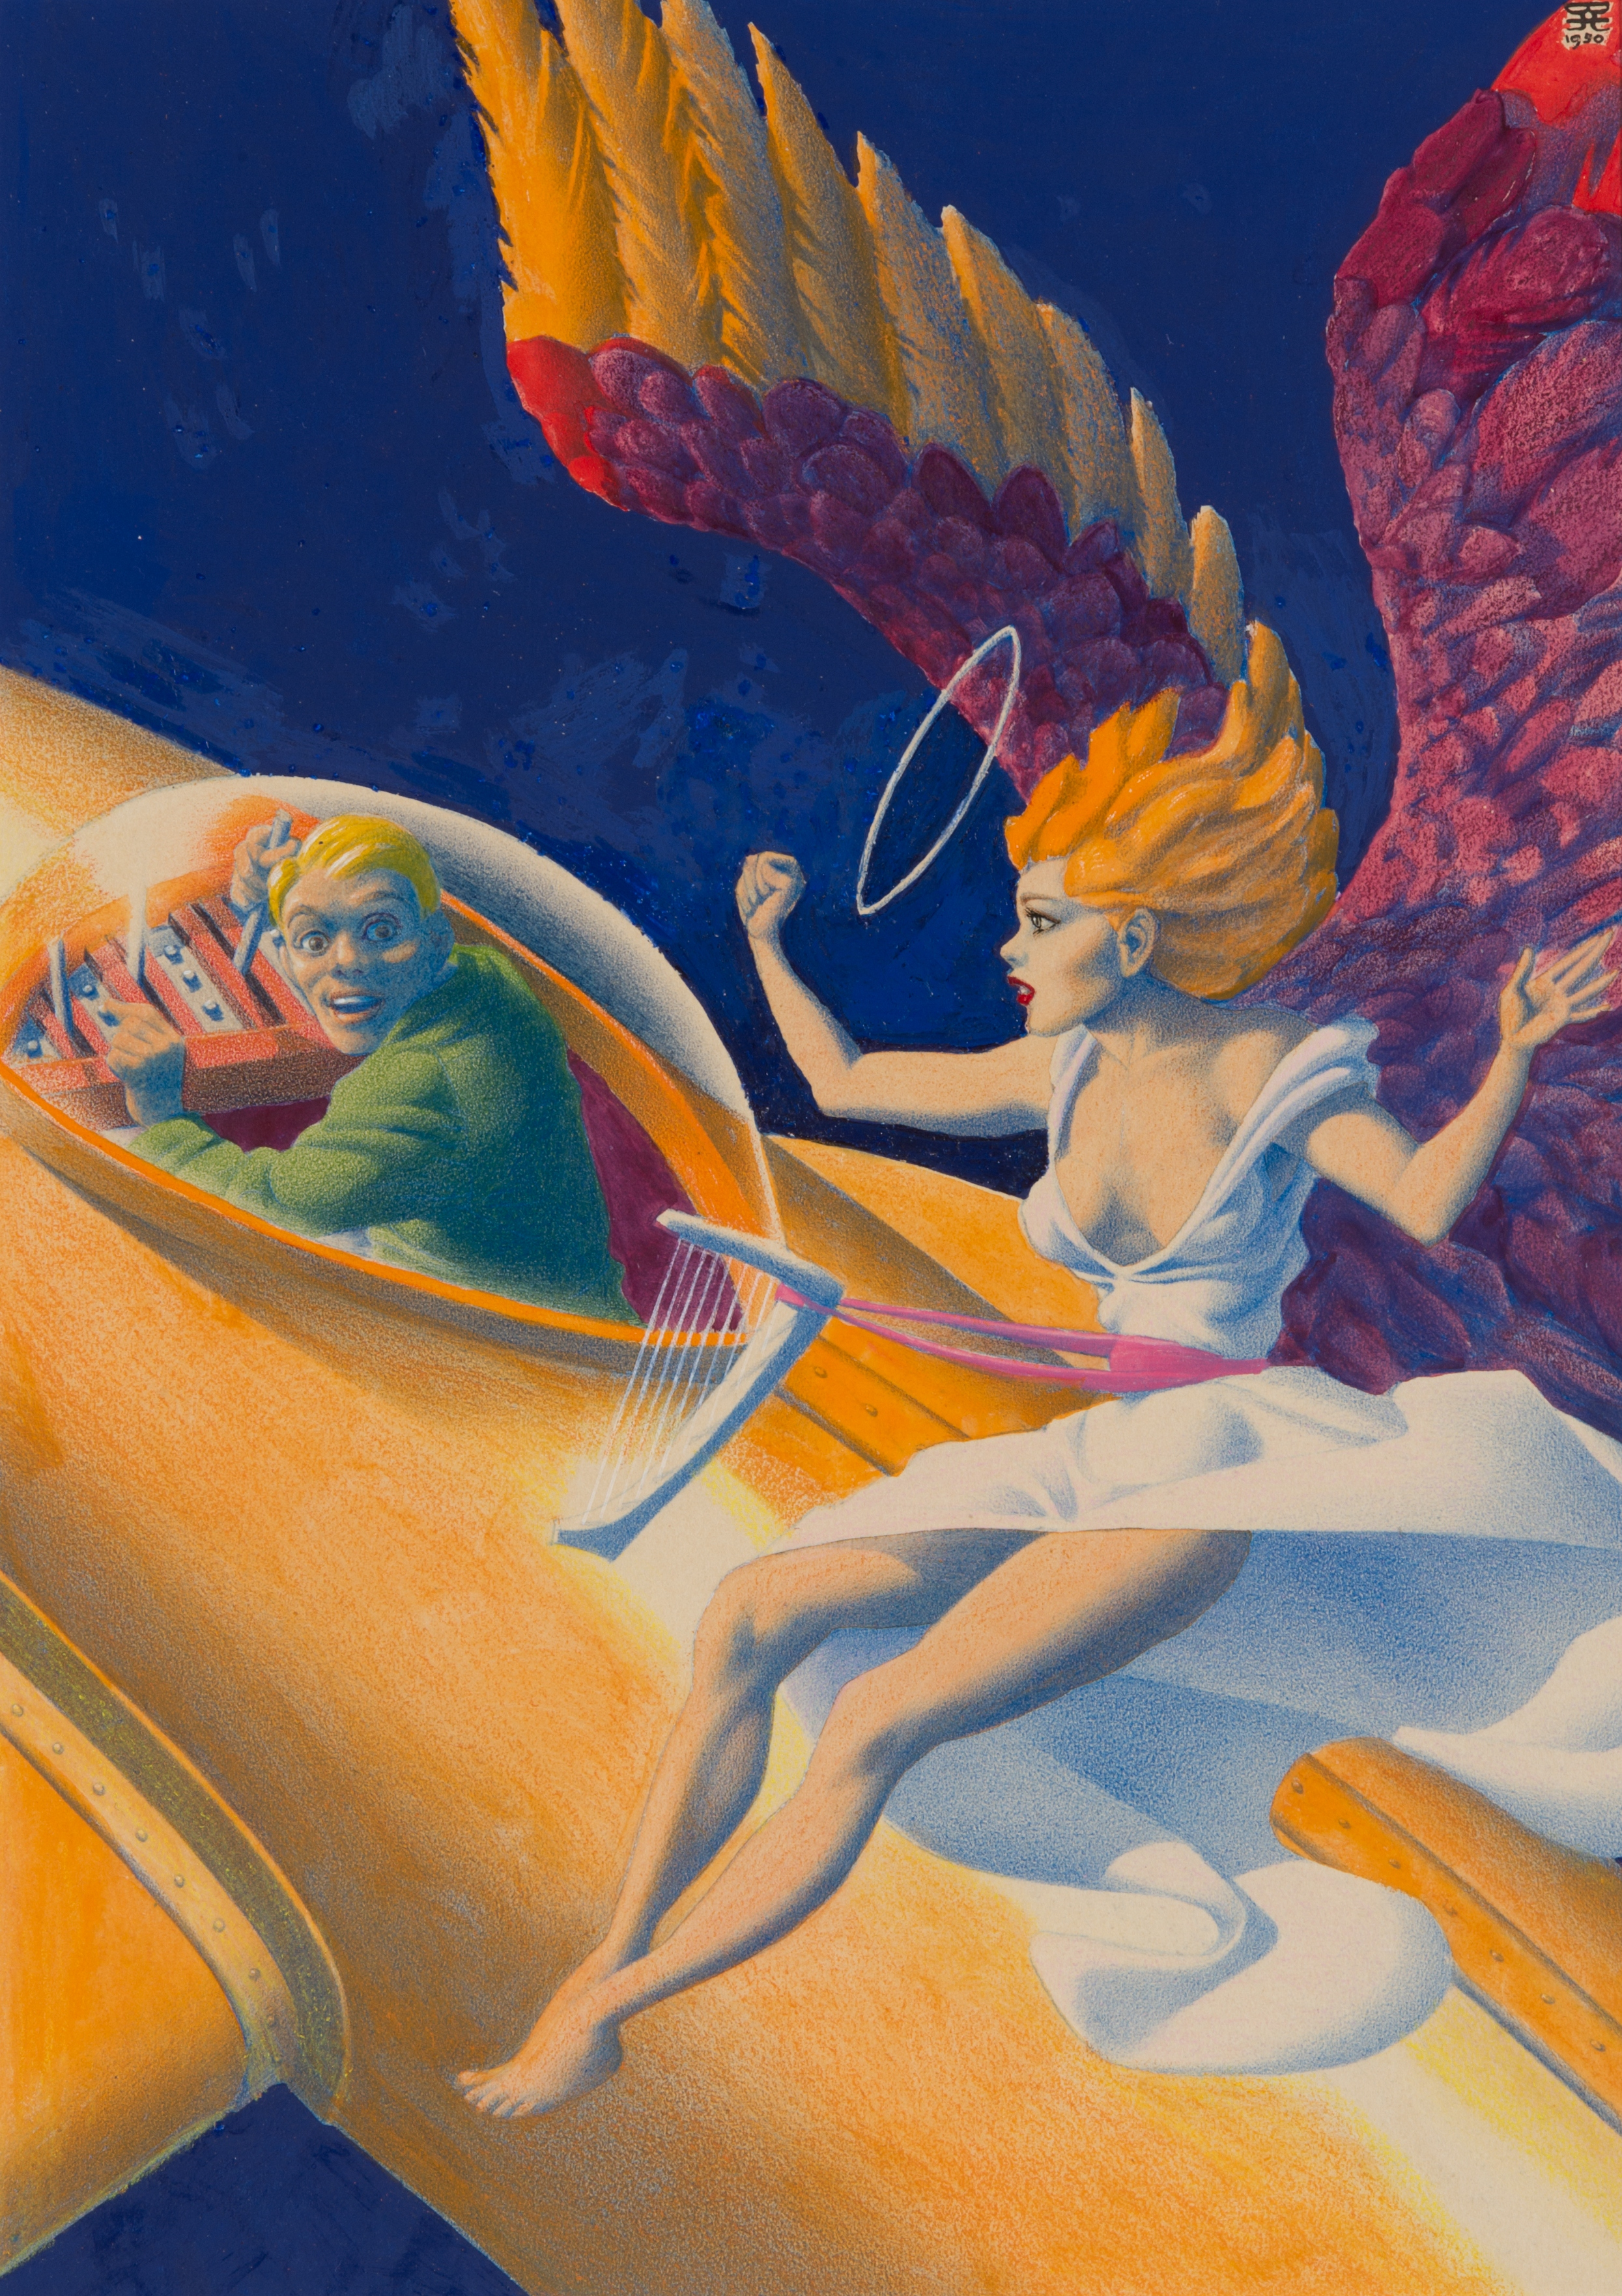 Bok, Hannes- Hell's Angel 3430-061-LR.jpg